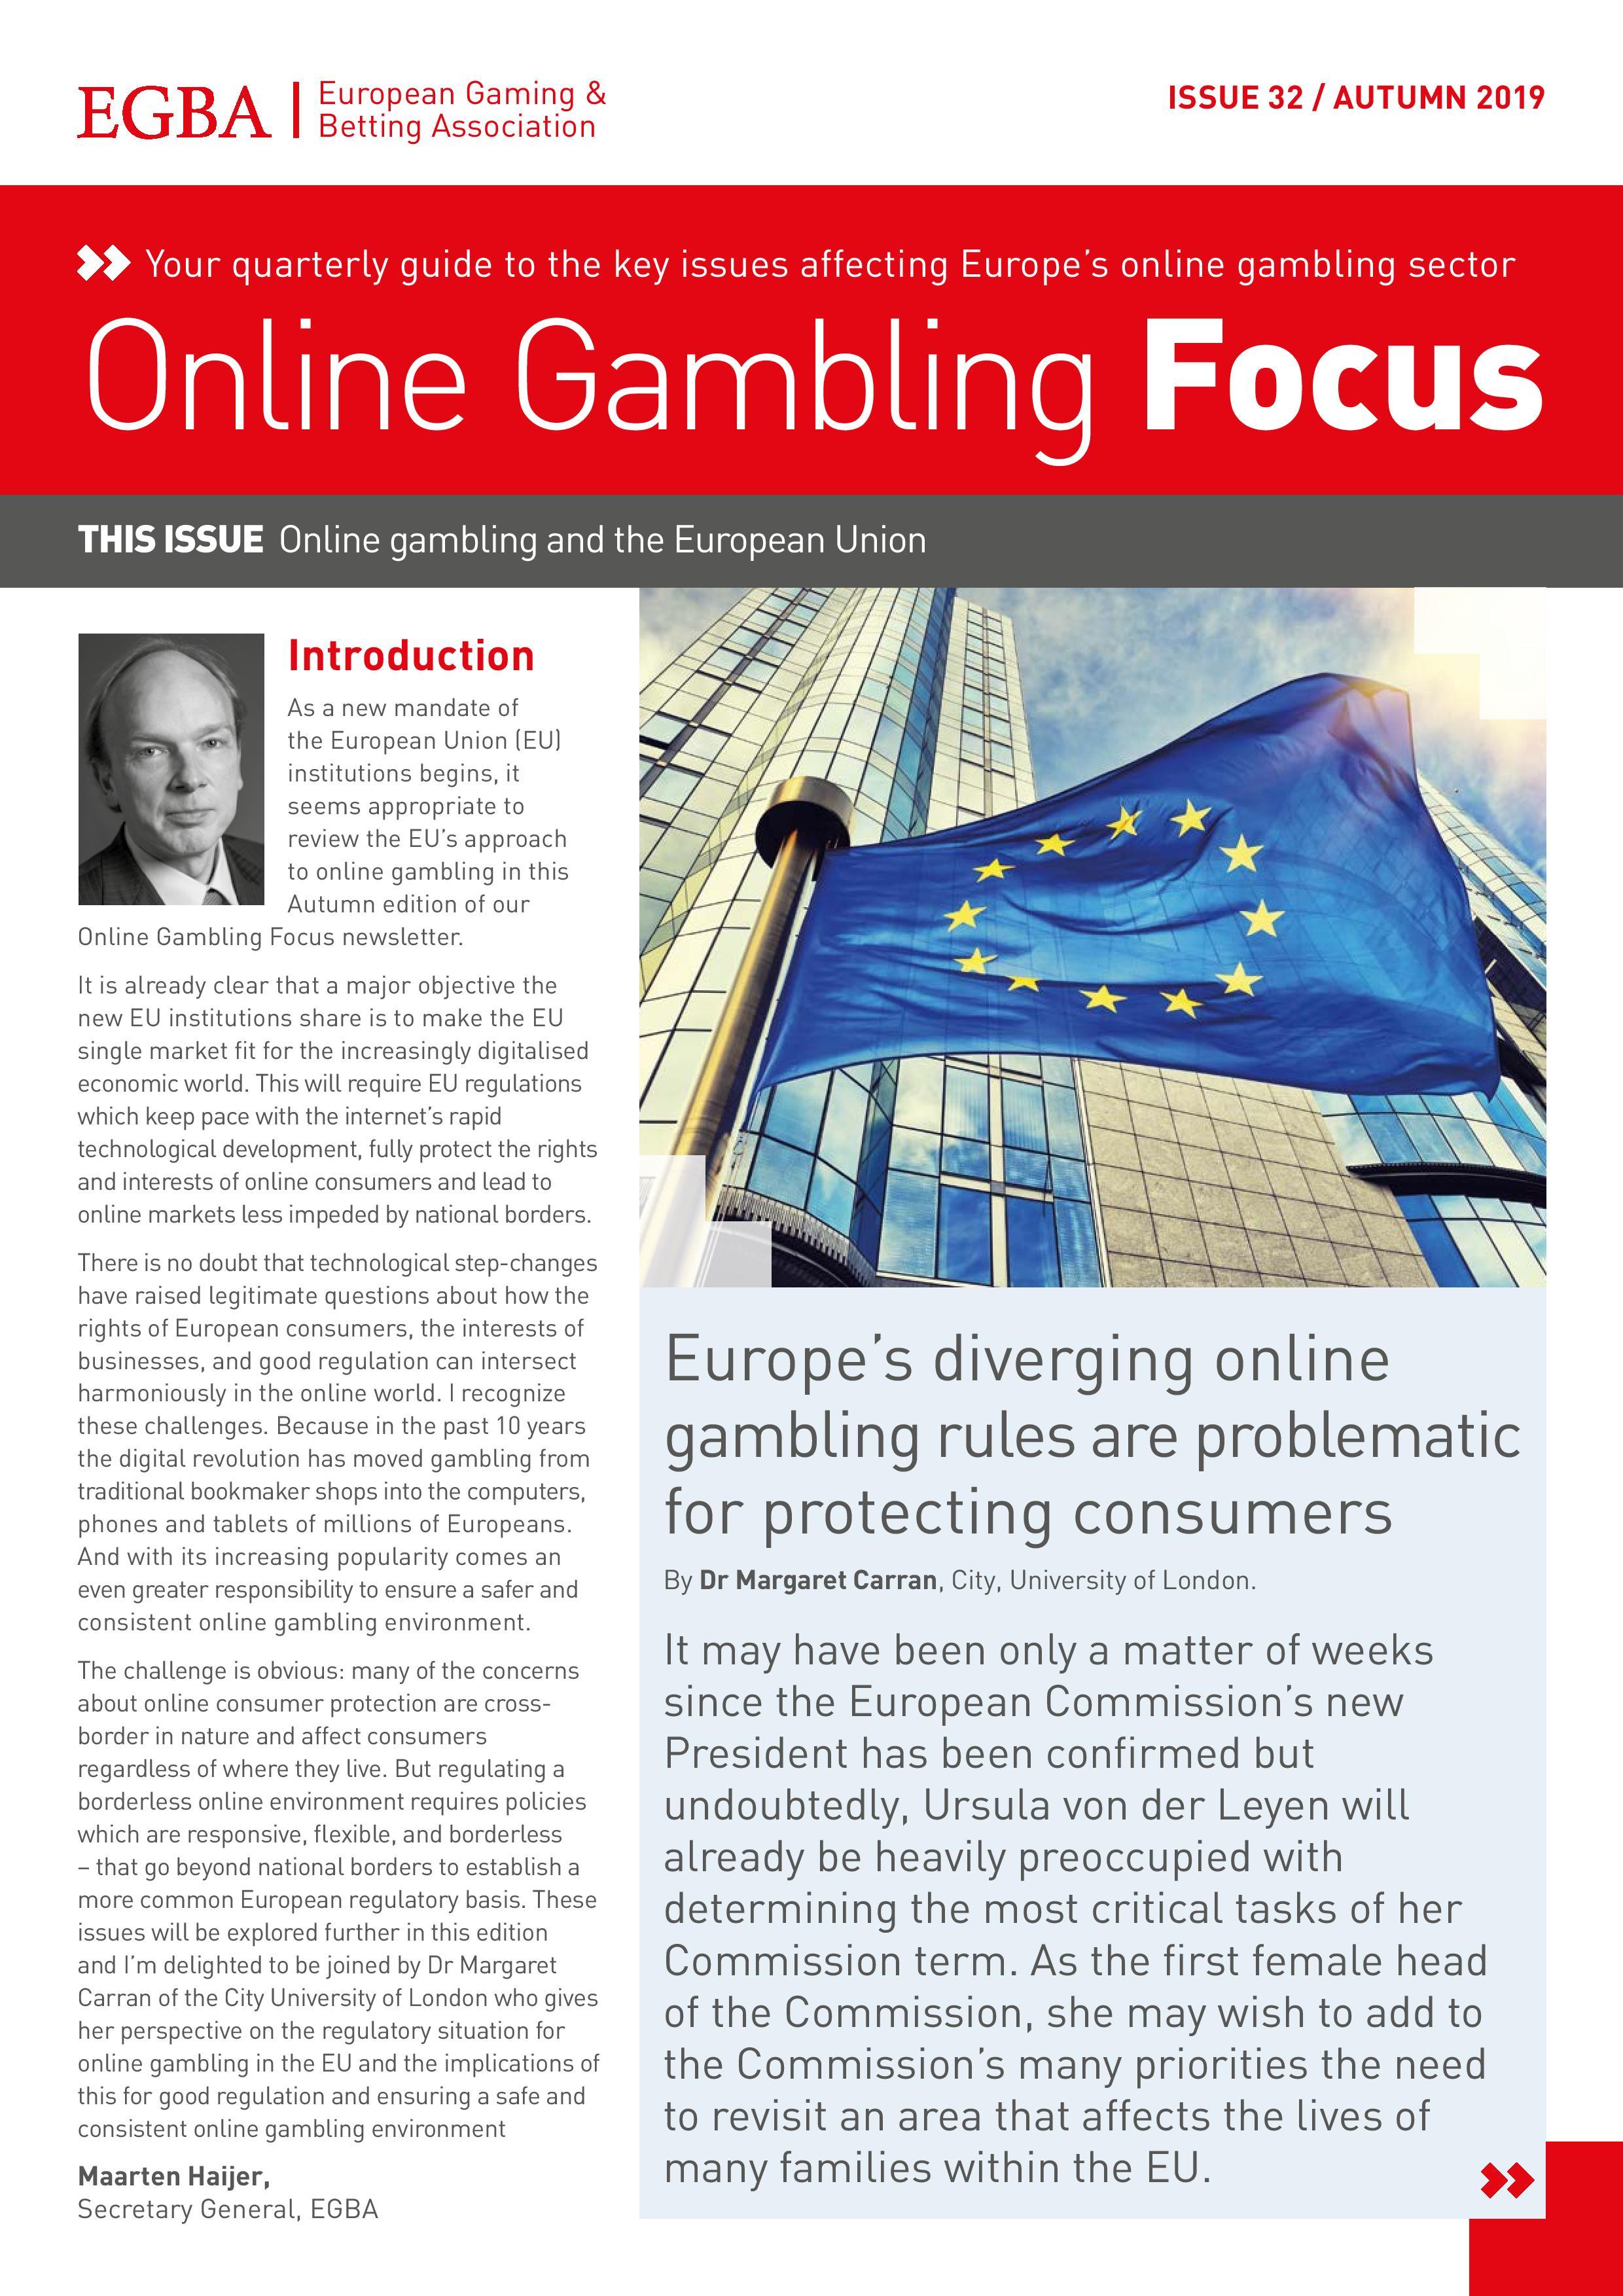 Online Gambling Focus - Autumn 2019